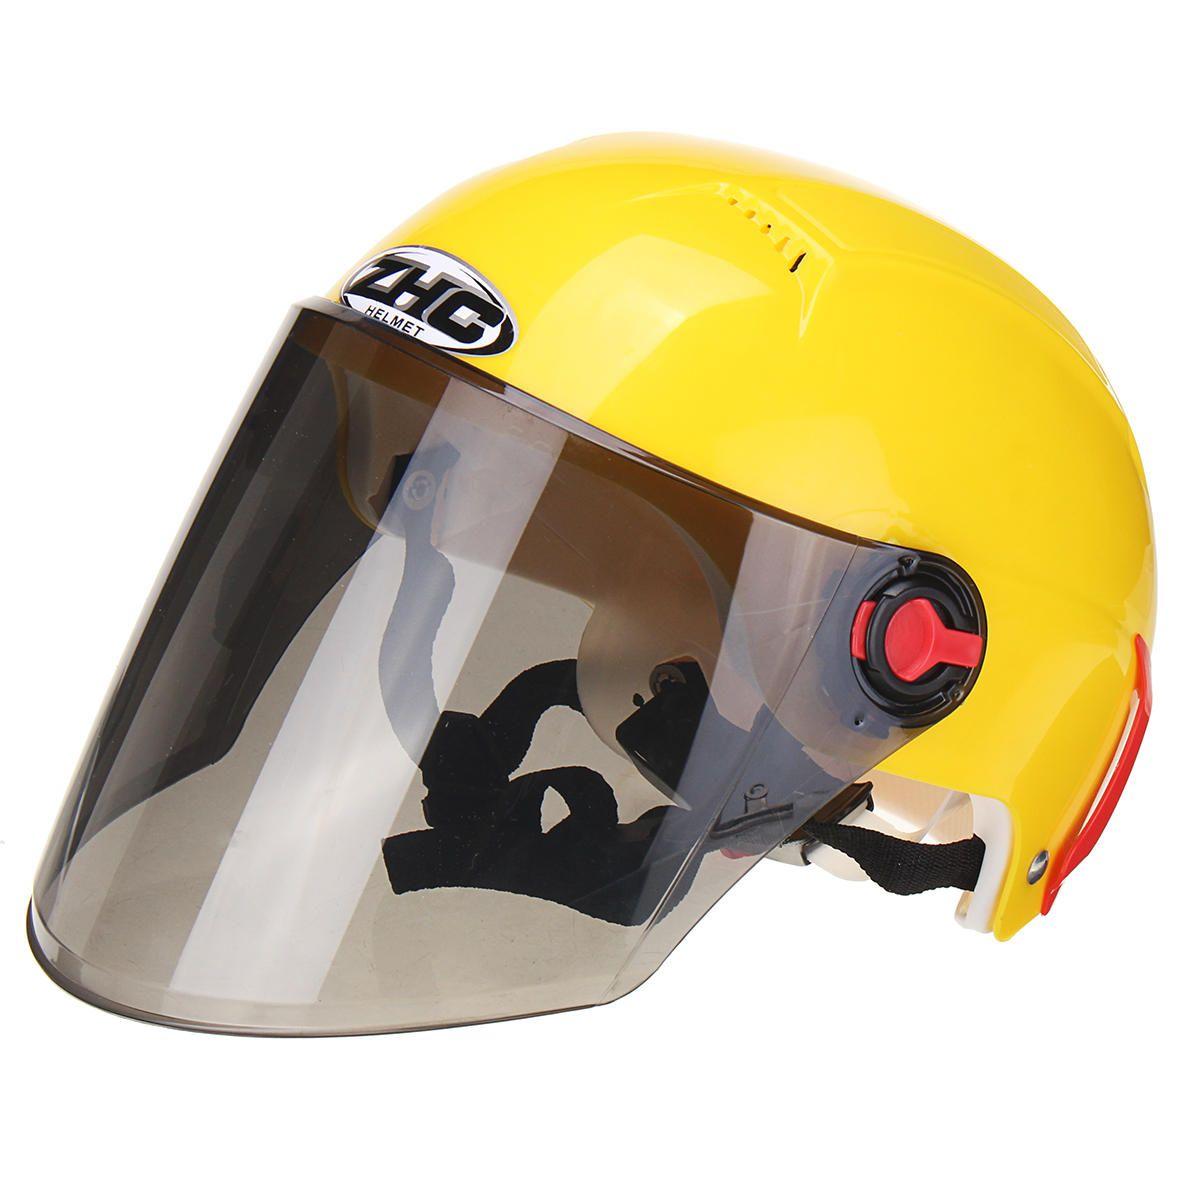 Motorcycle Half Face Helmet Cycling Outdoor Sports Ultraviolet Proof Helmets In 2020 Helmet Outdoor Sports Ultra Violet